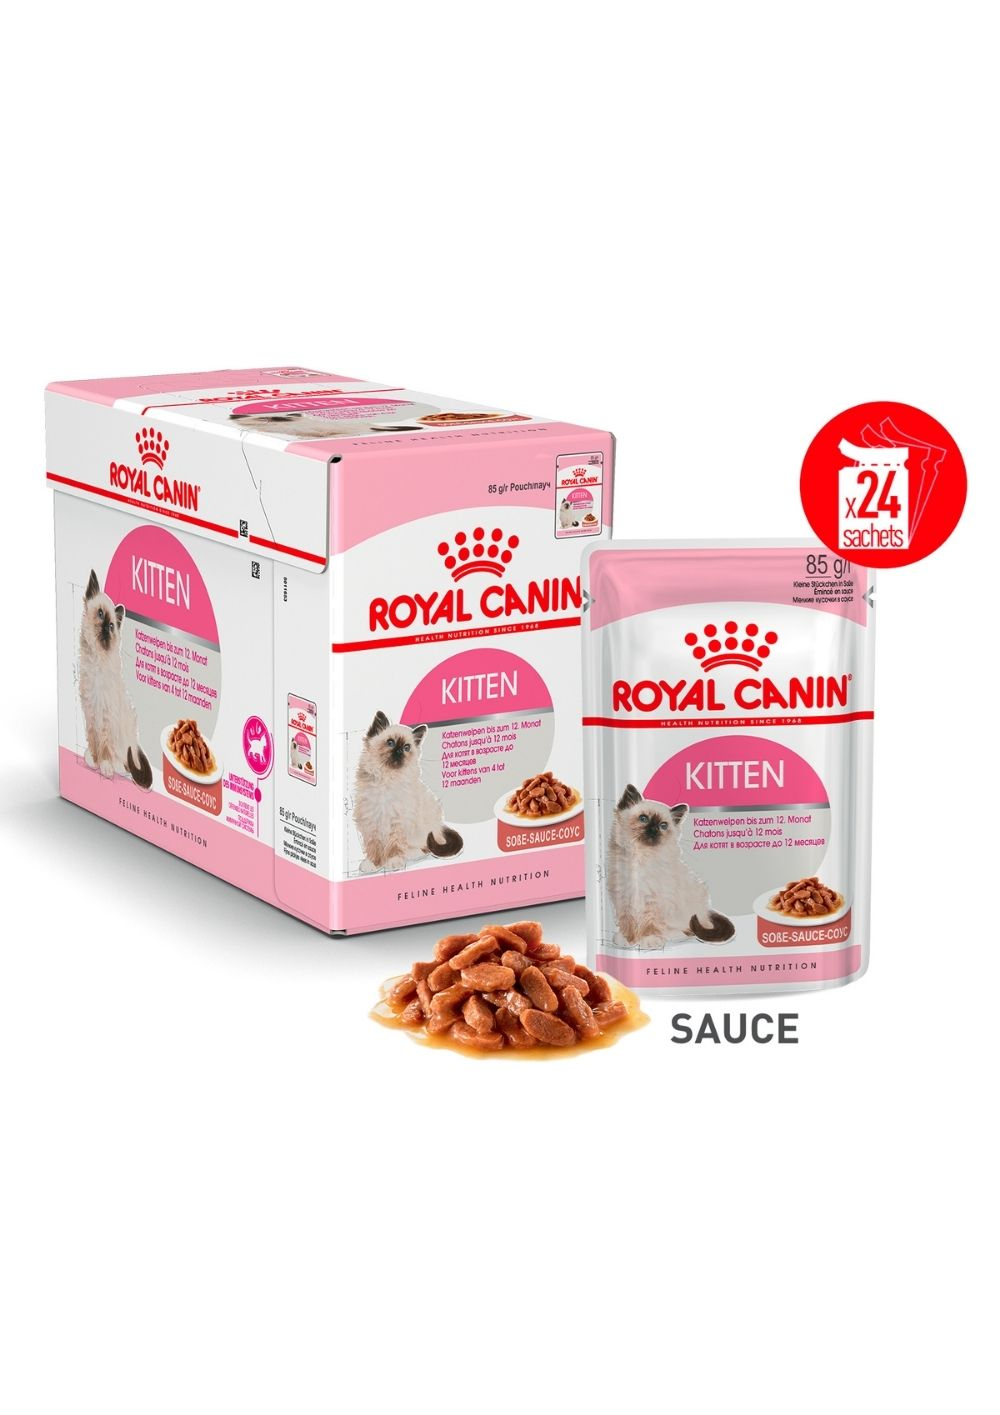 Kitten en Sauce x24 product image